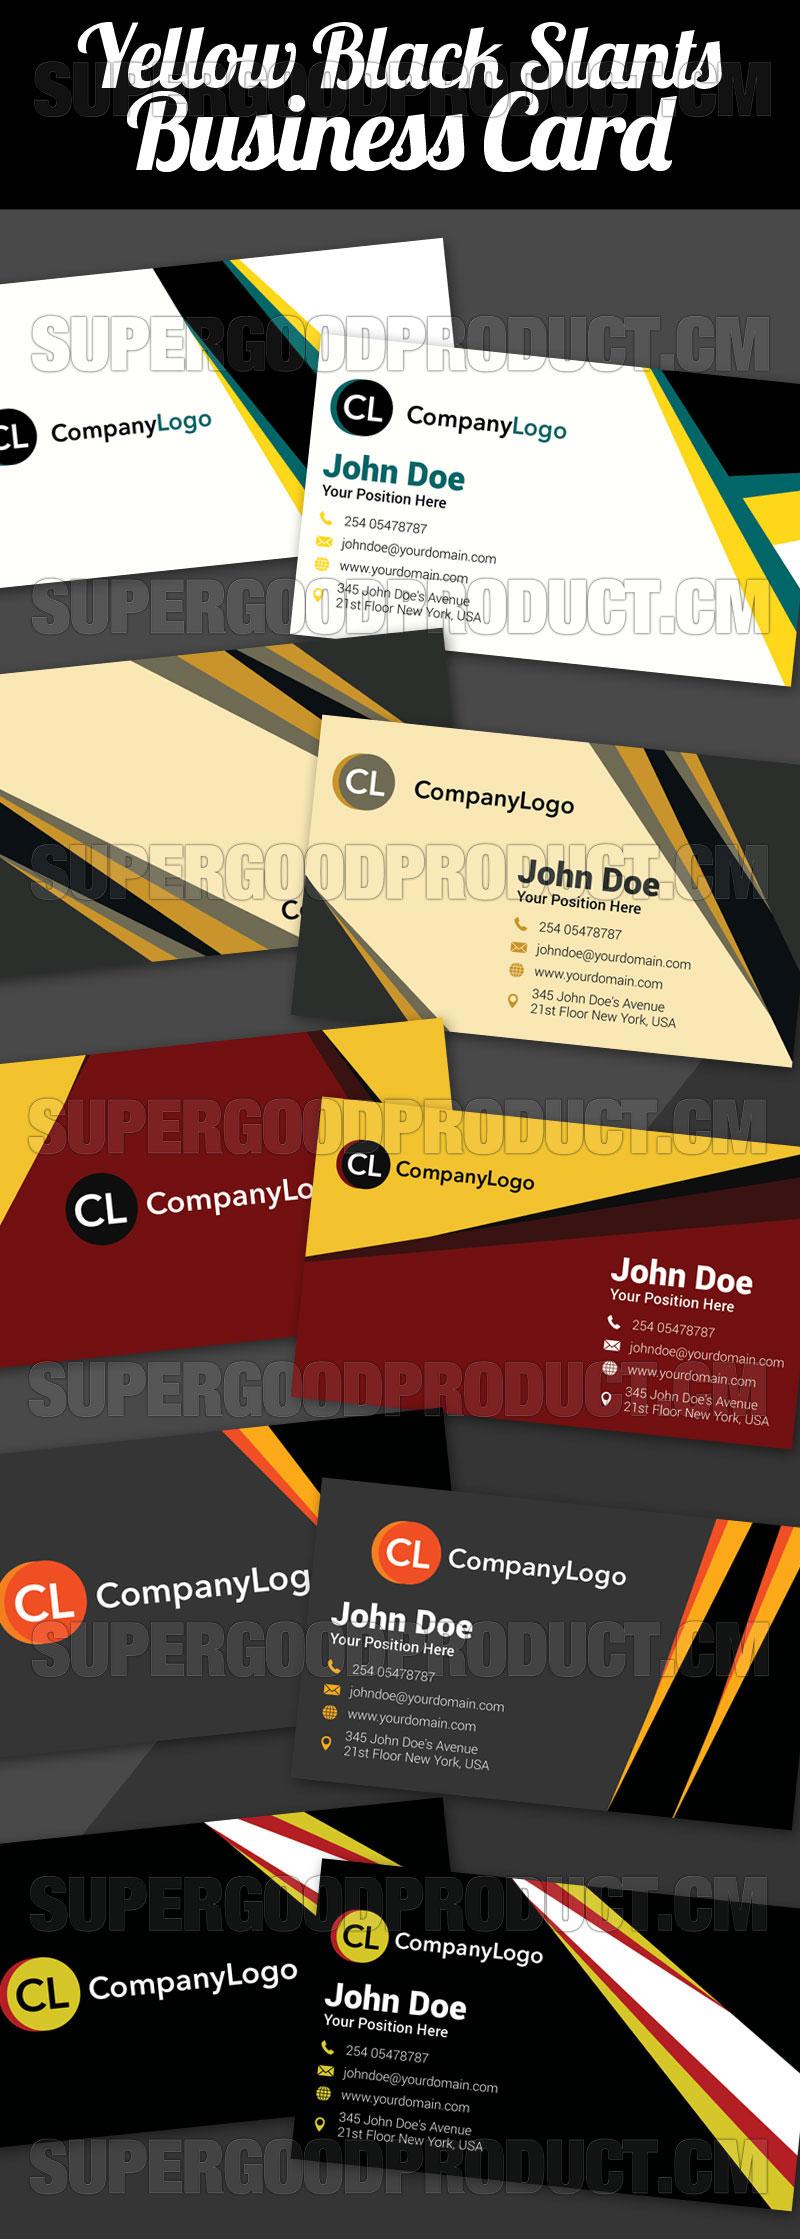 Yellow-Black-Slants-Business-Cards